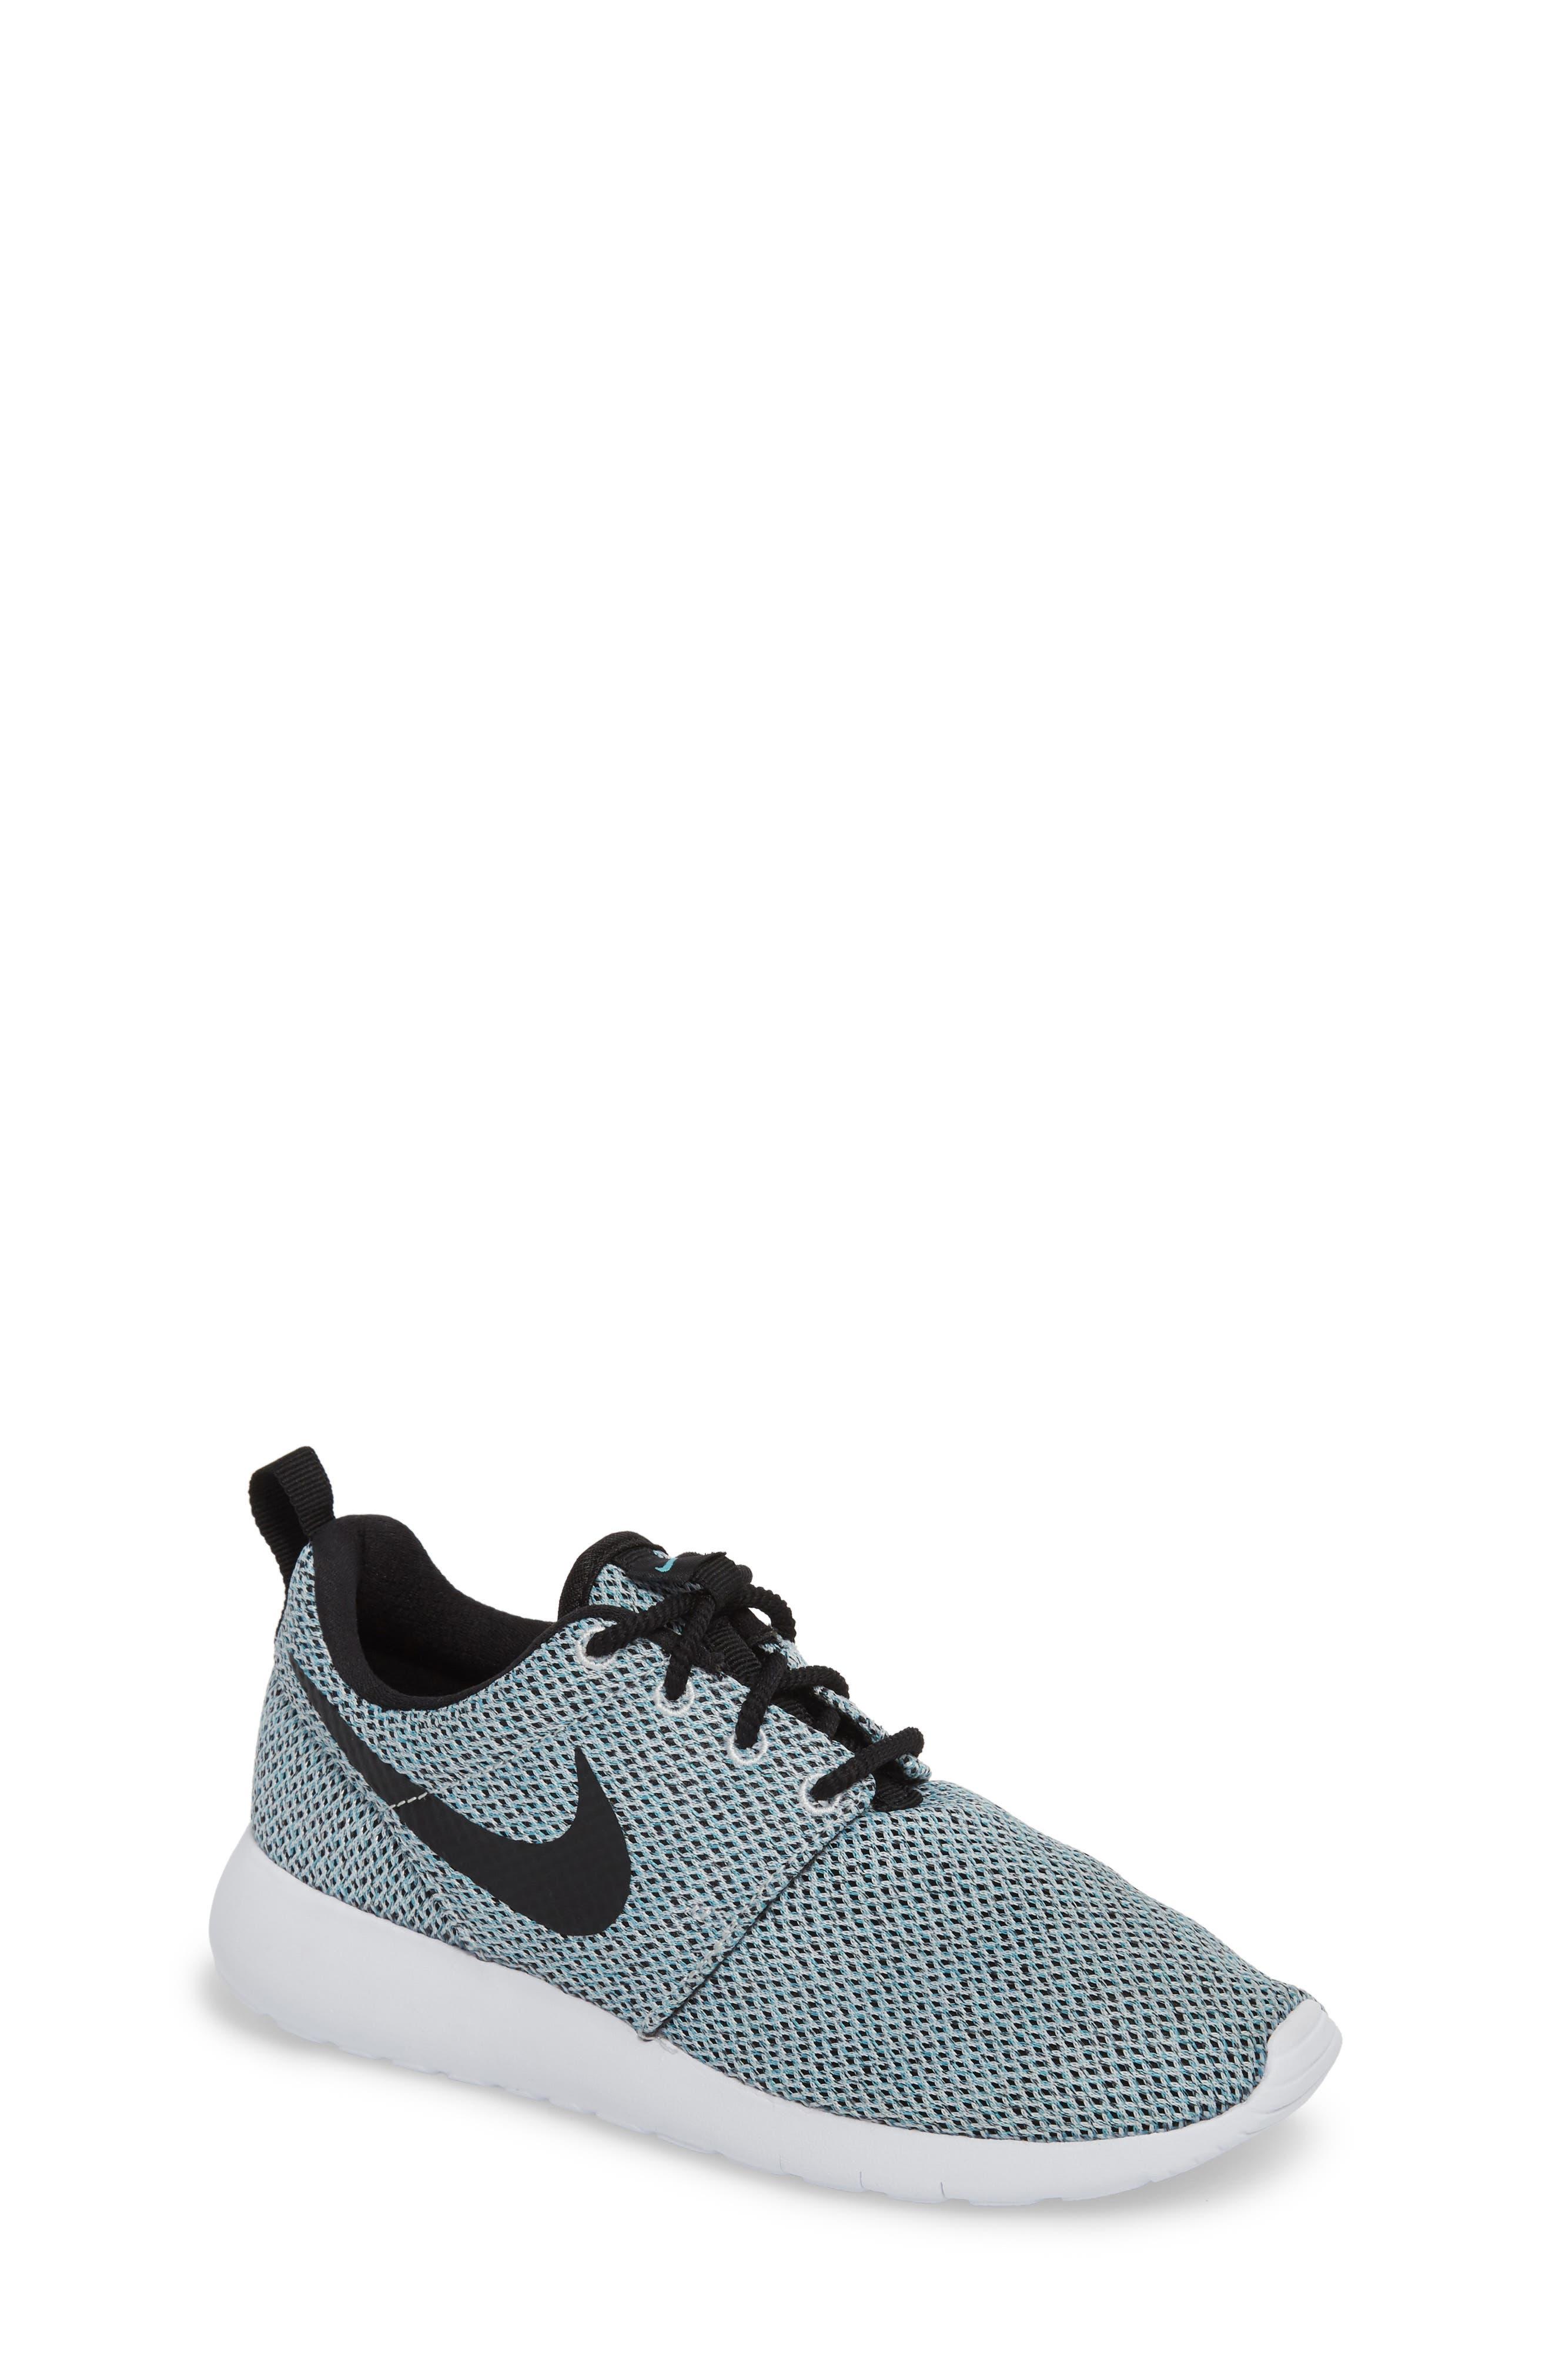 'Roshe Run' Athletic Shoe,                             Main thumbnail 2, color,